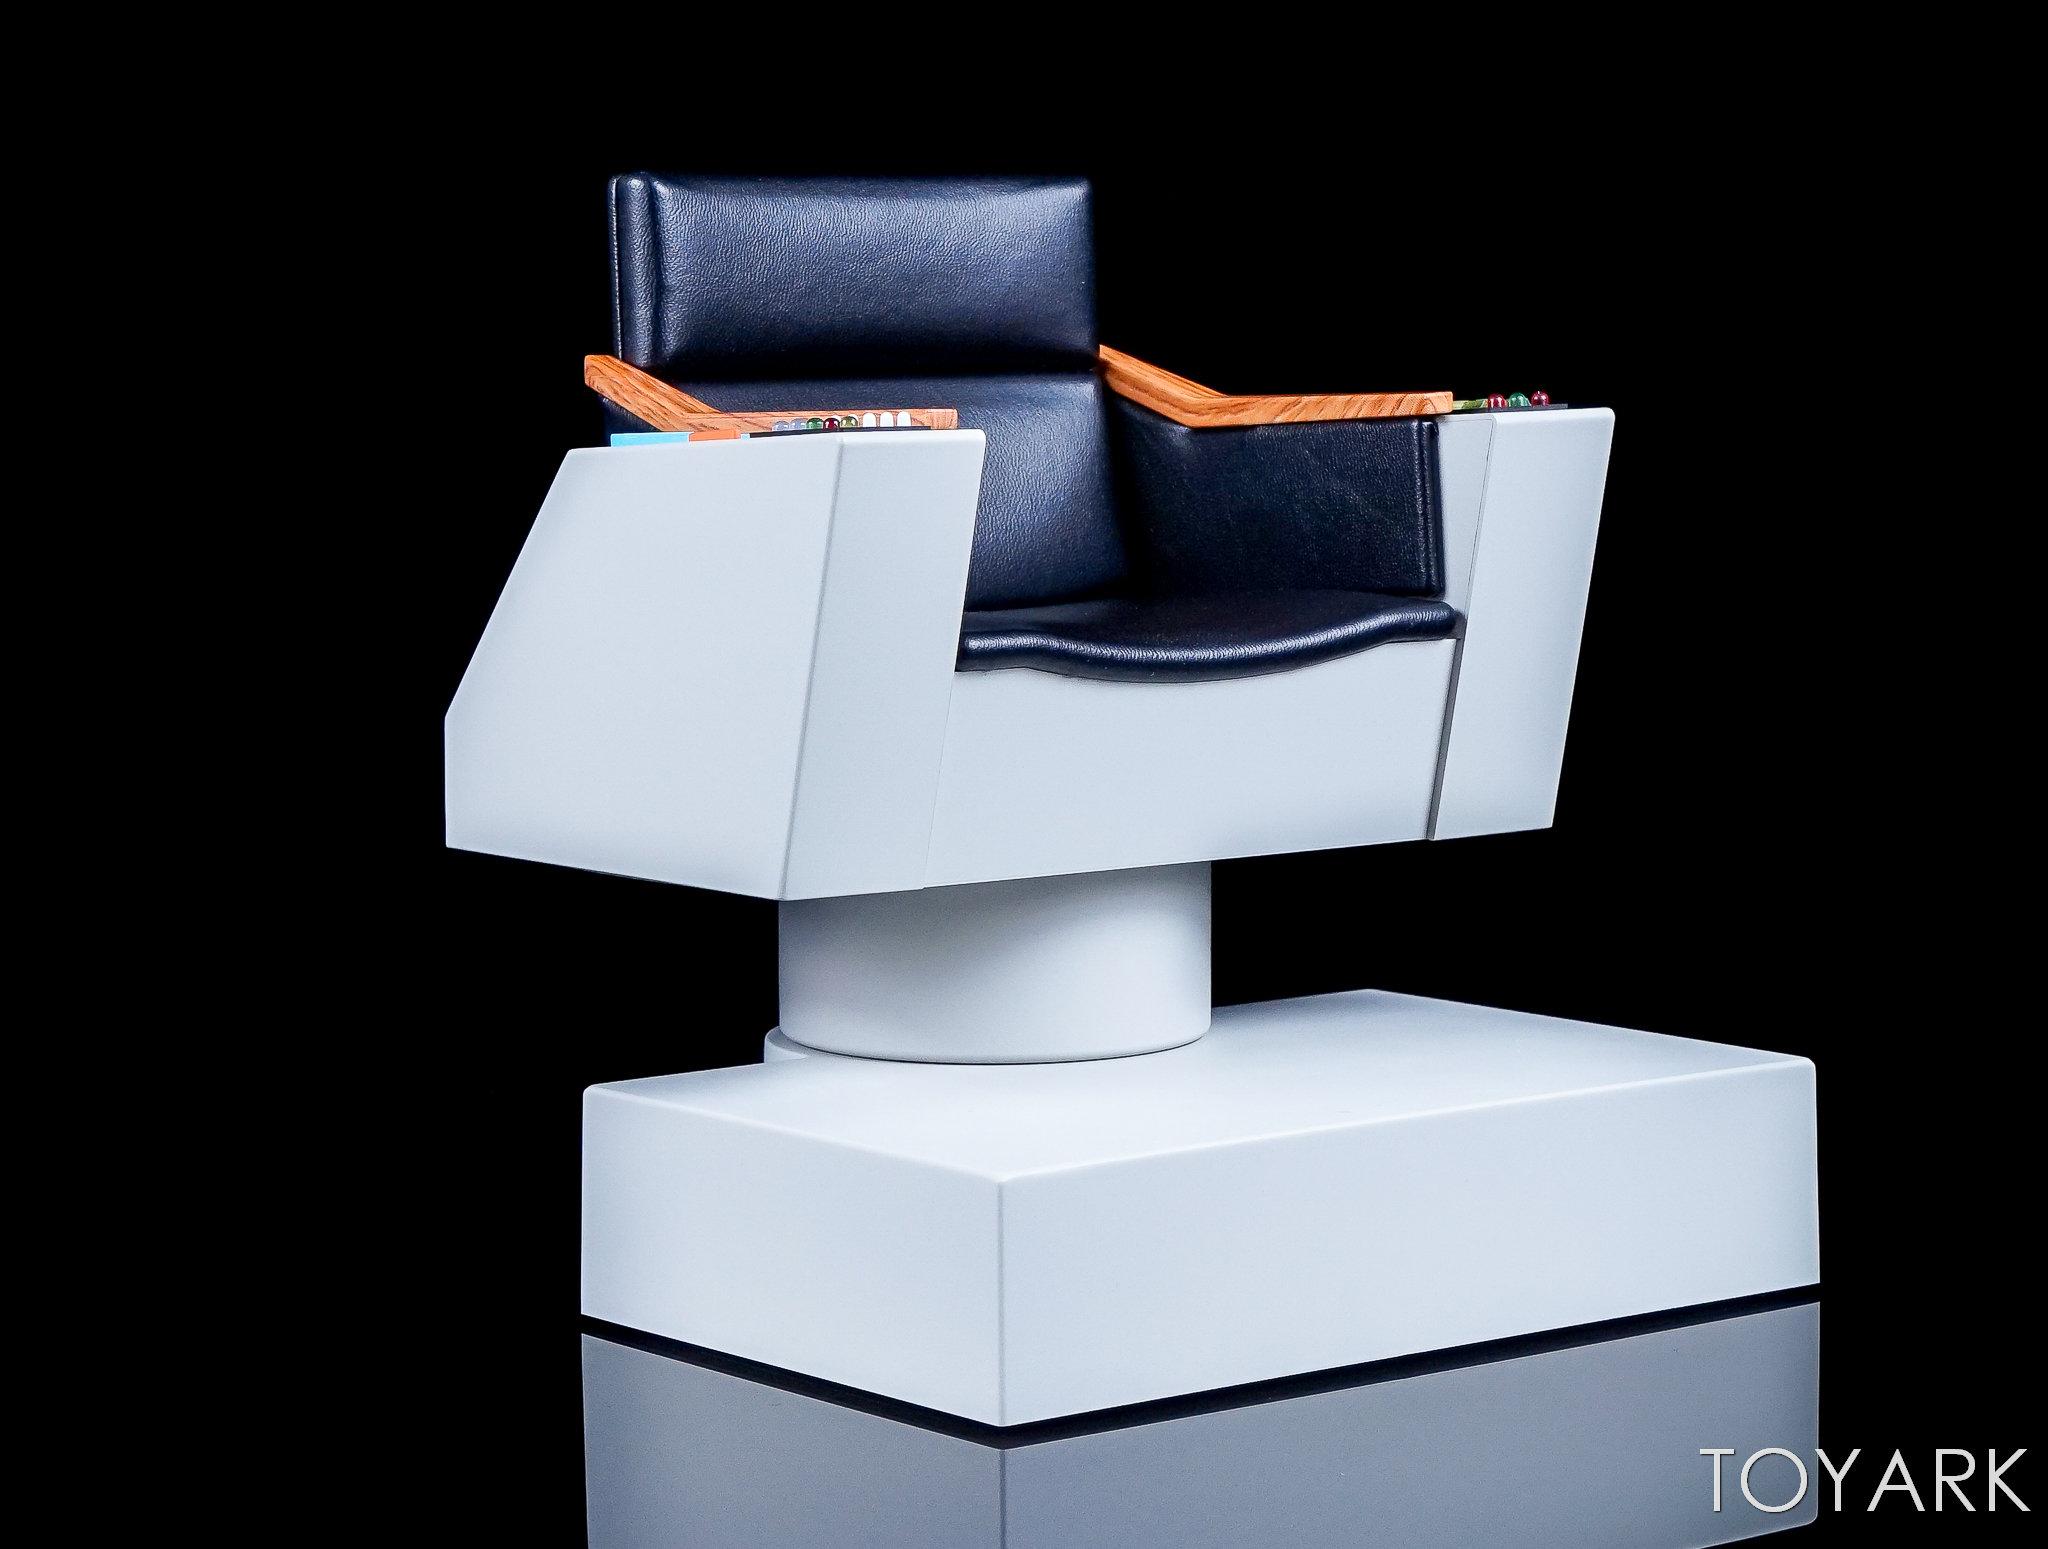 star trek captains chair office stool qmx the original series 1 6 scale captain 39s